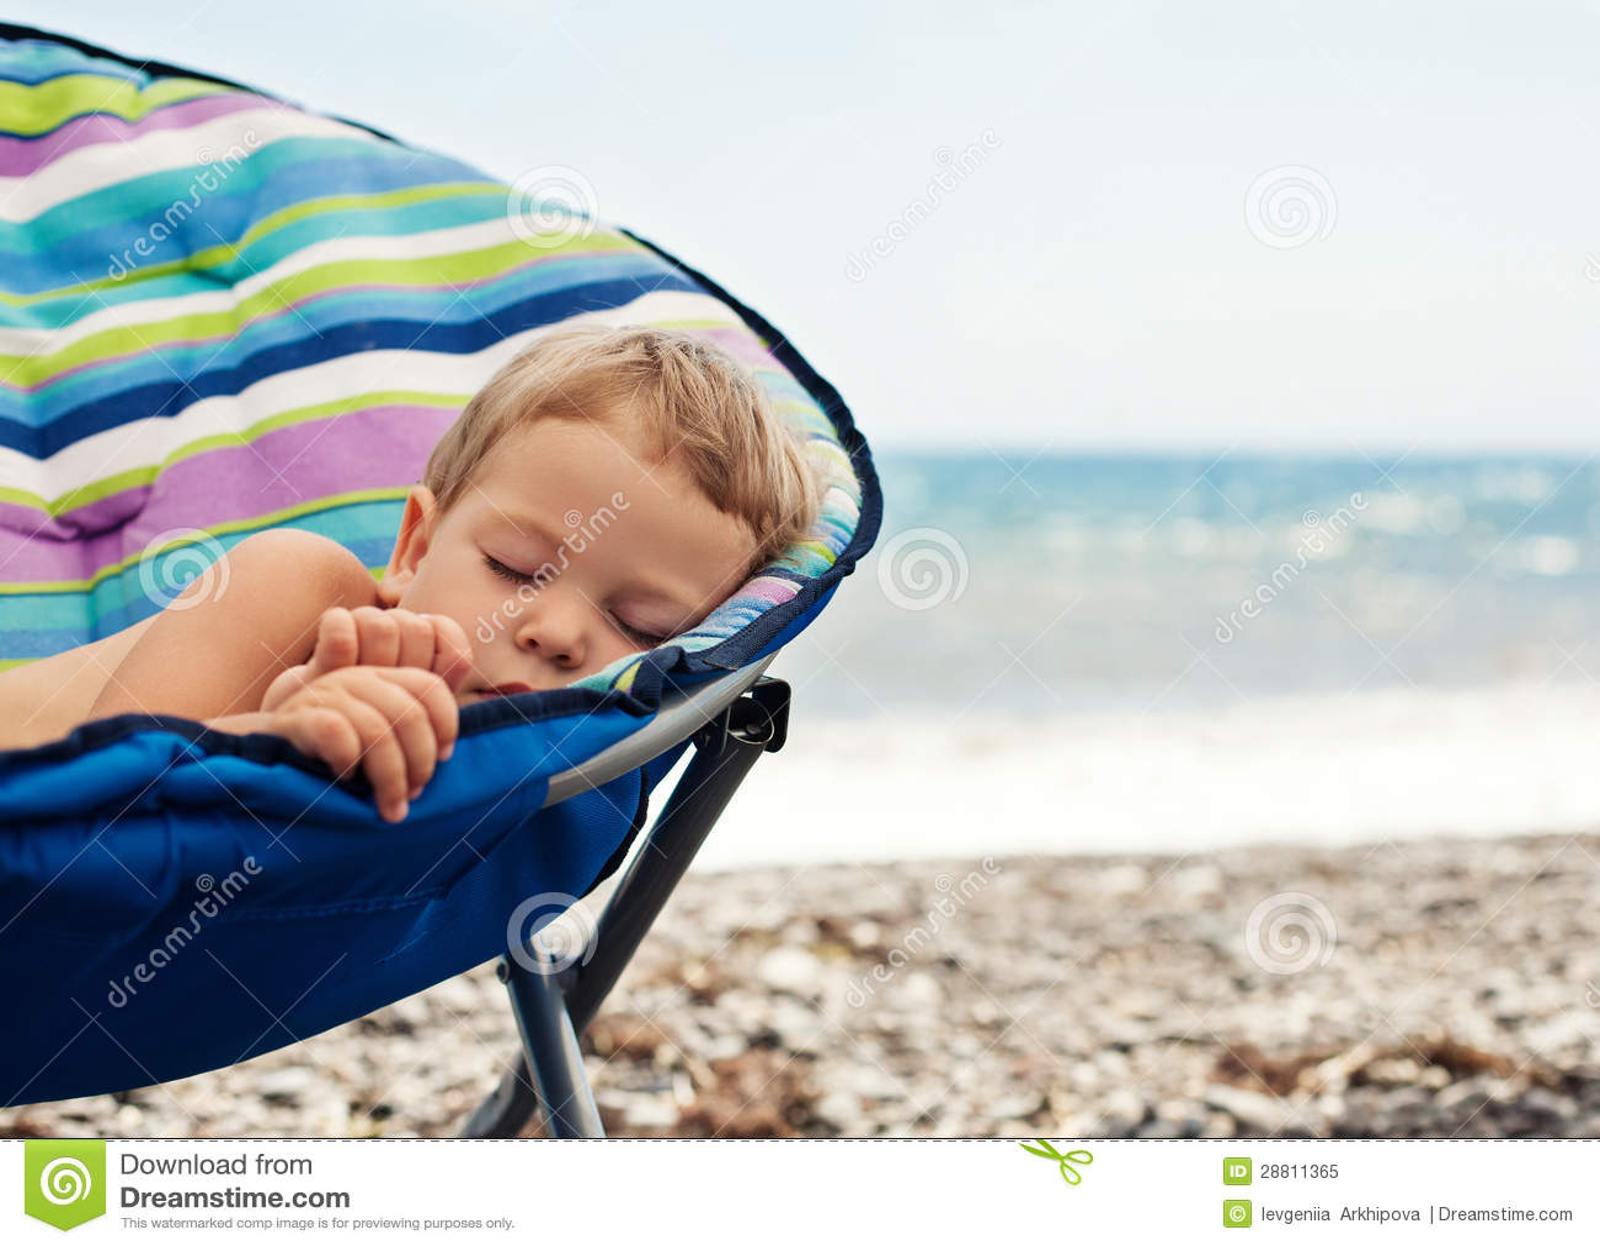 Дети спят на пляже фото